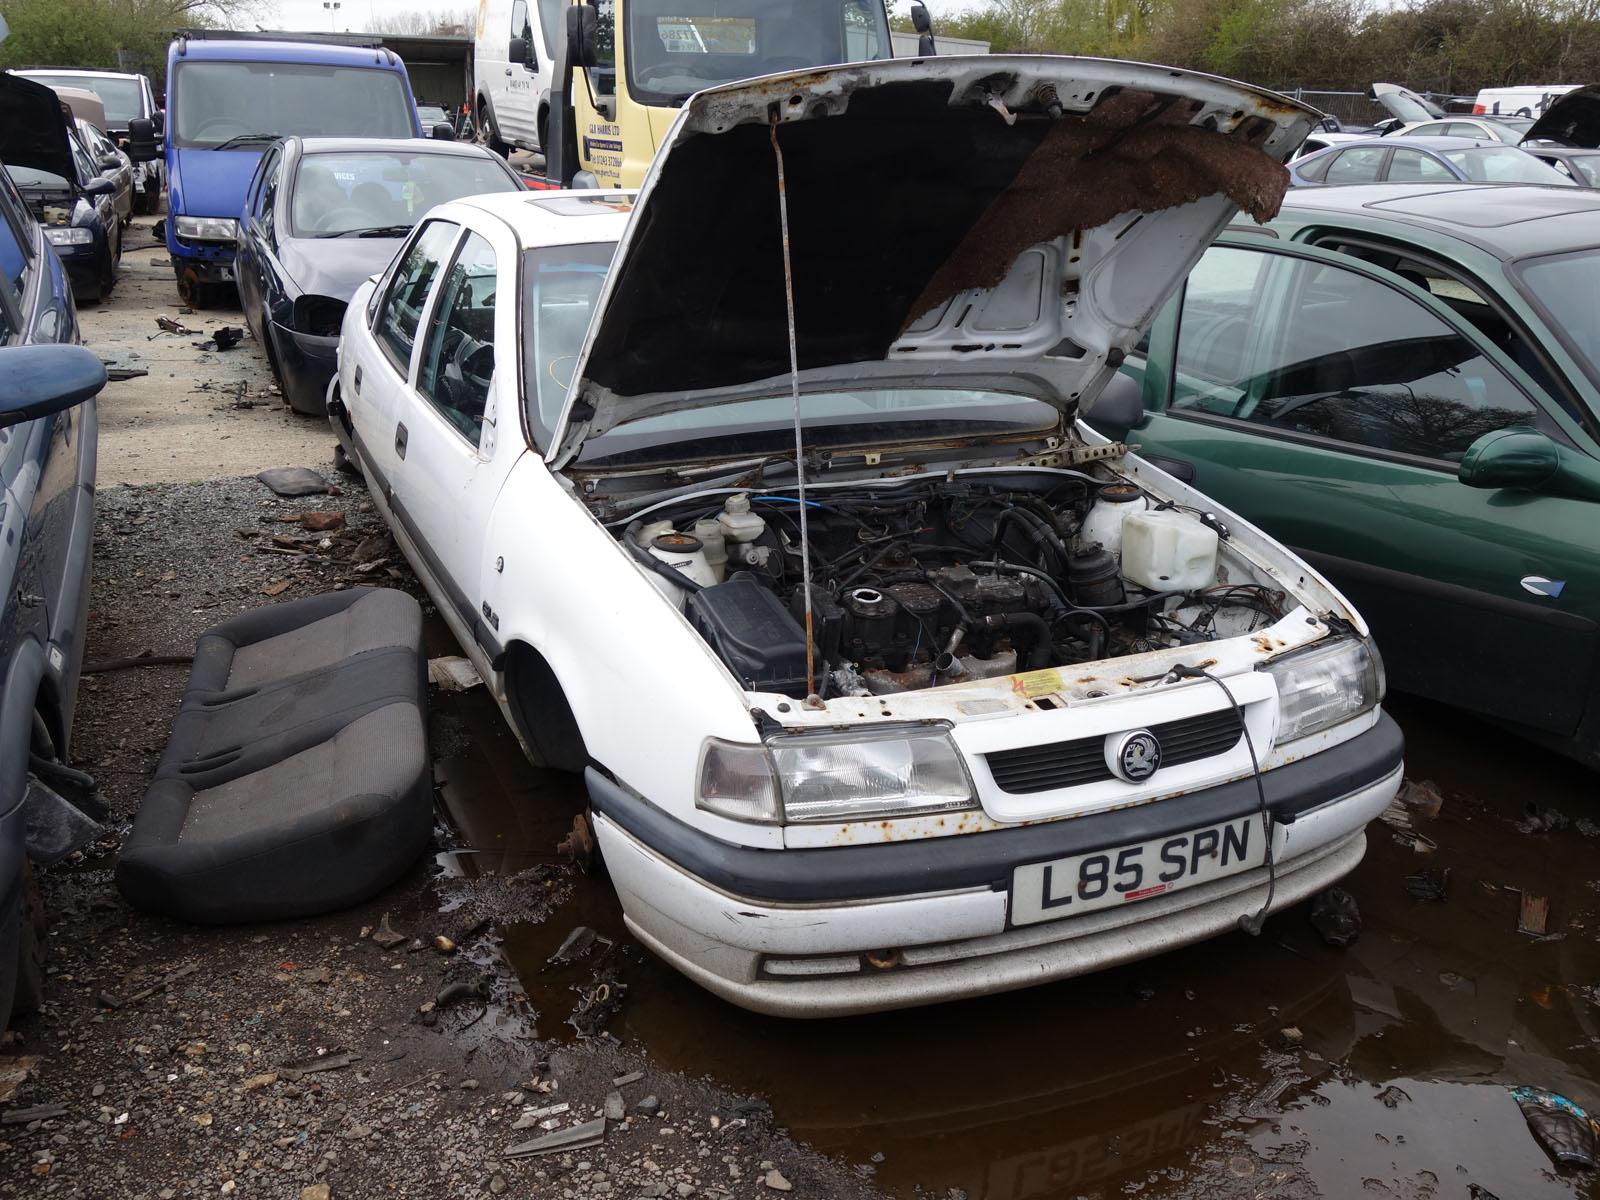 Scrap Cars Near Me >> Scrapyard G&R Harris (Renault 5 van for sale. Orange) - AutoShite - Autoshite